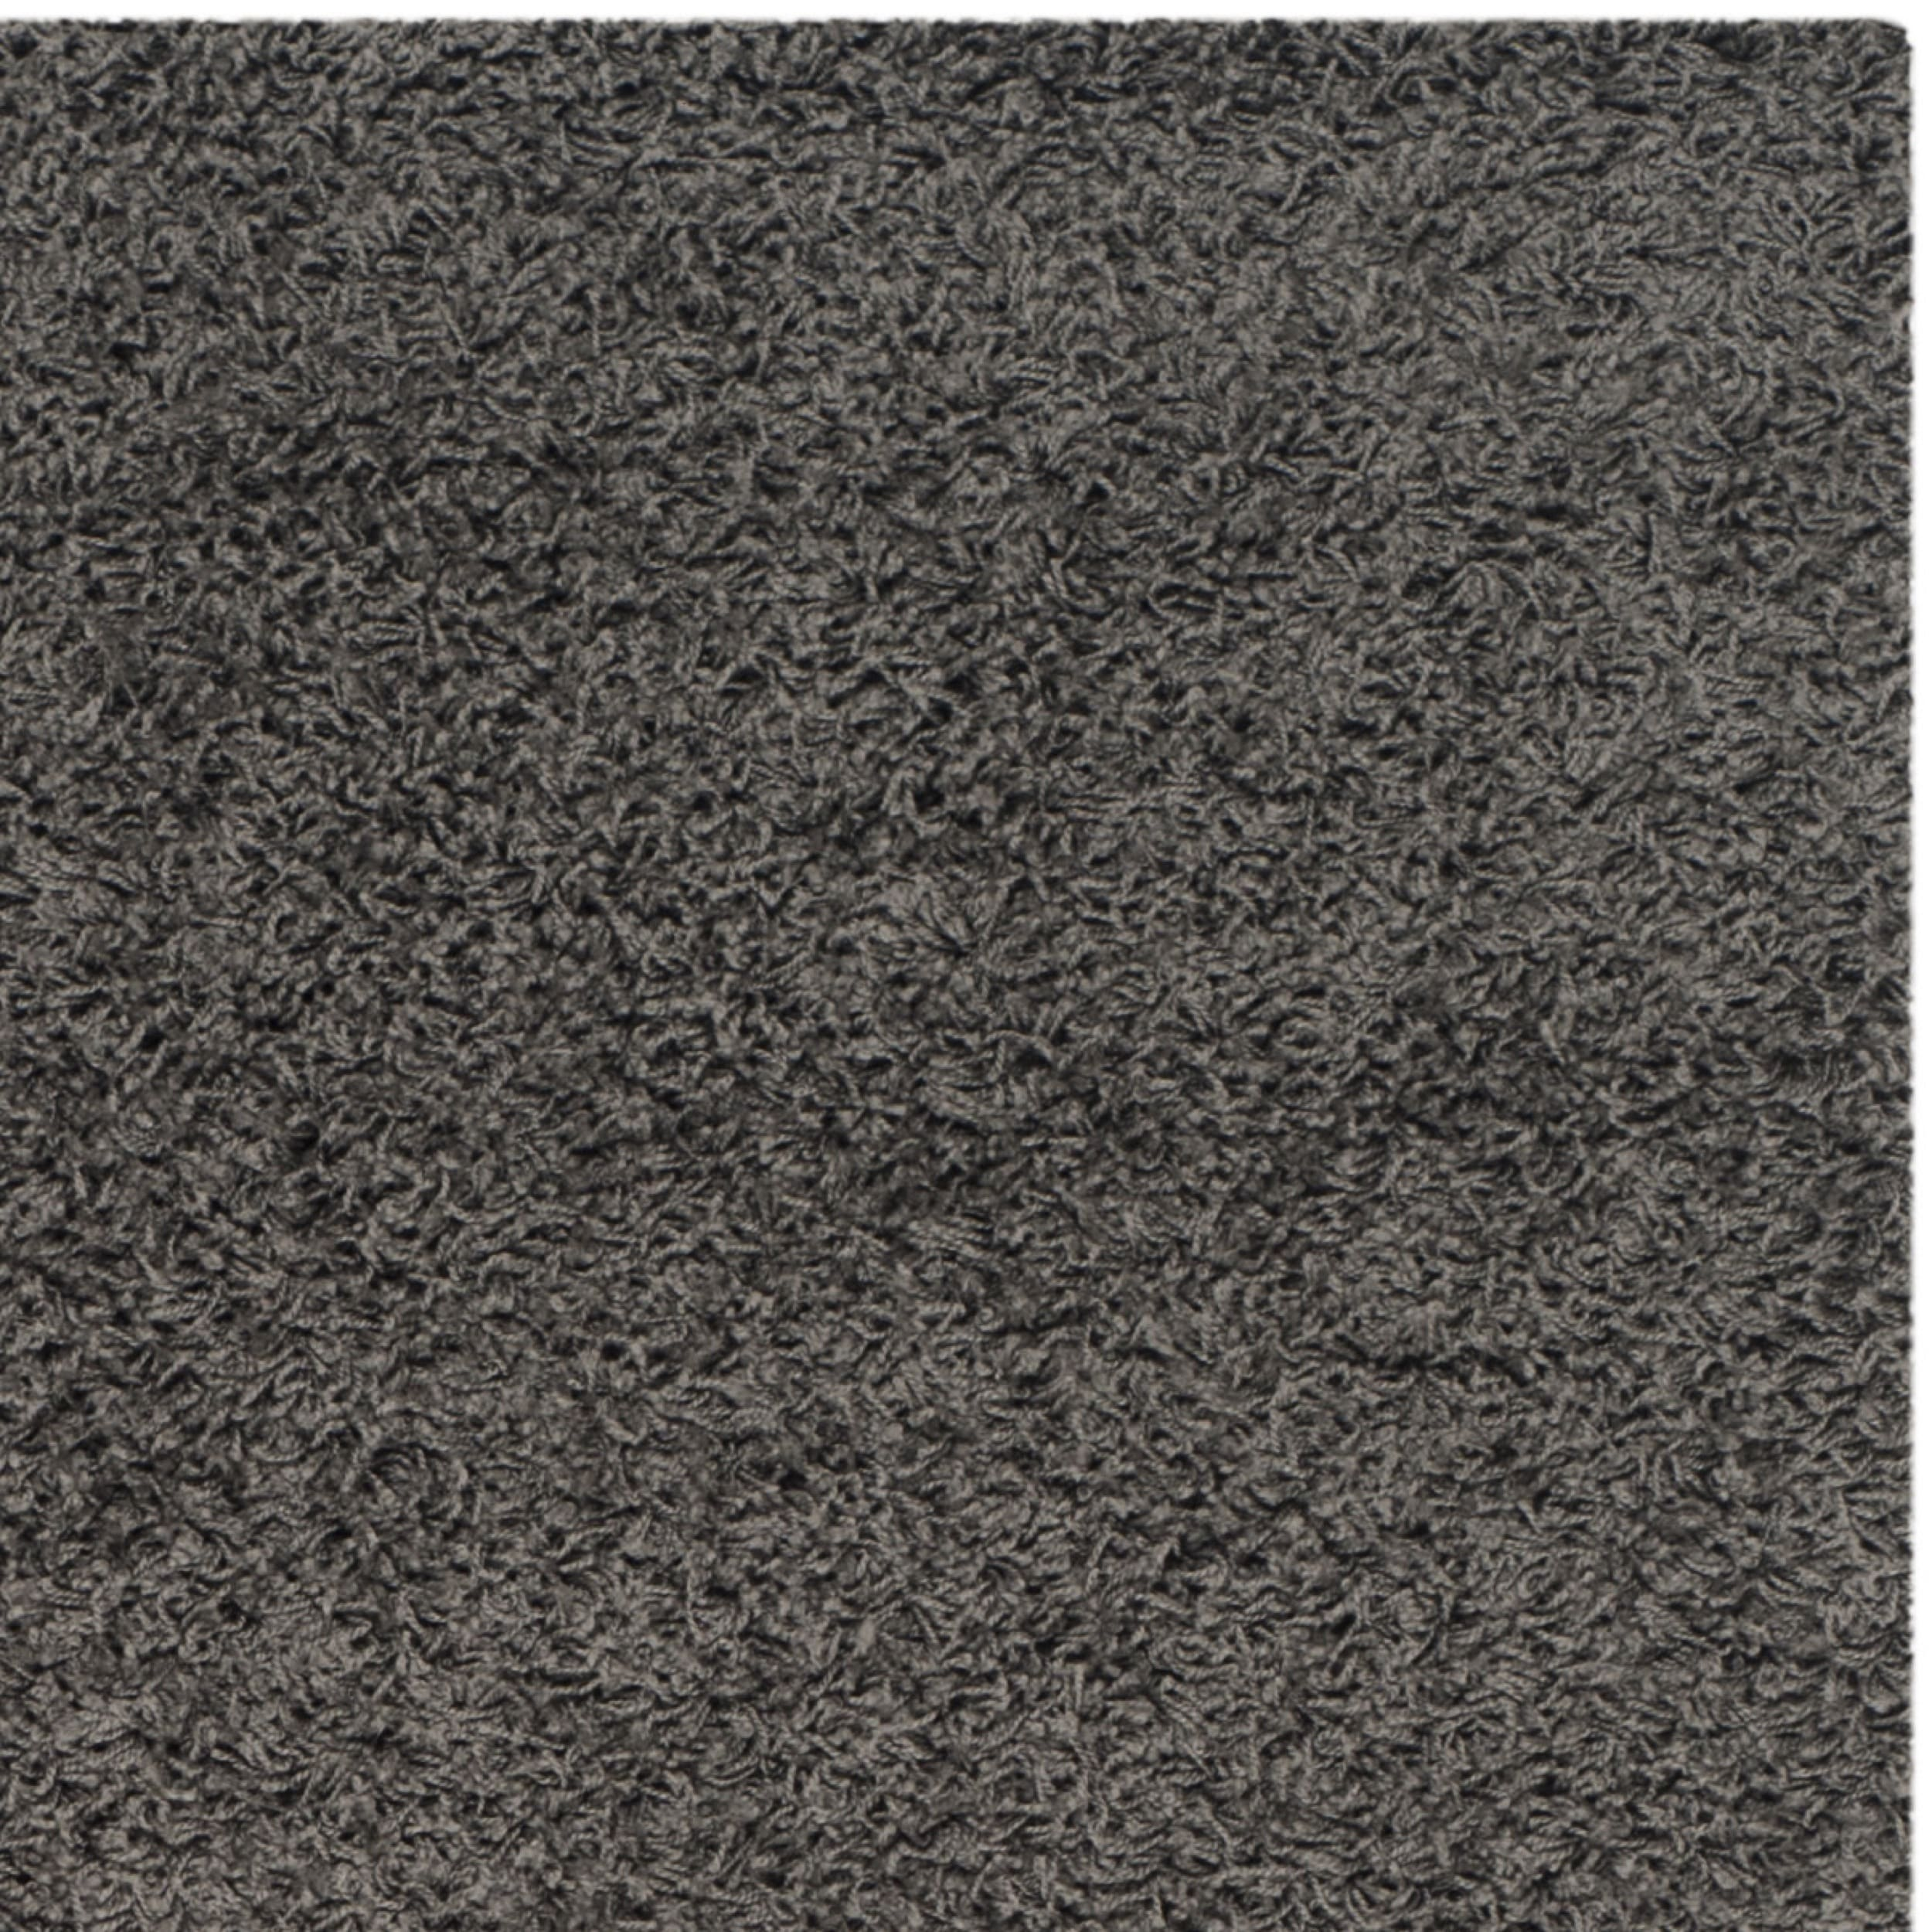 solid com modern gray area rug co super amazon high shag cozy grey light nongzi rugs